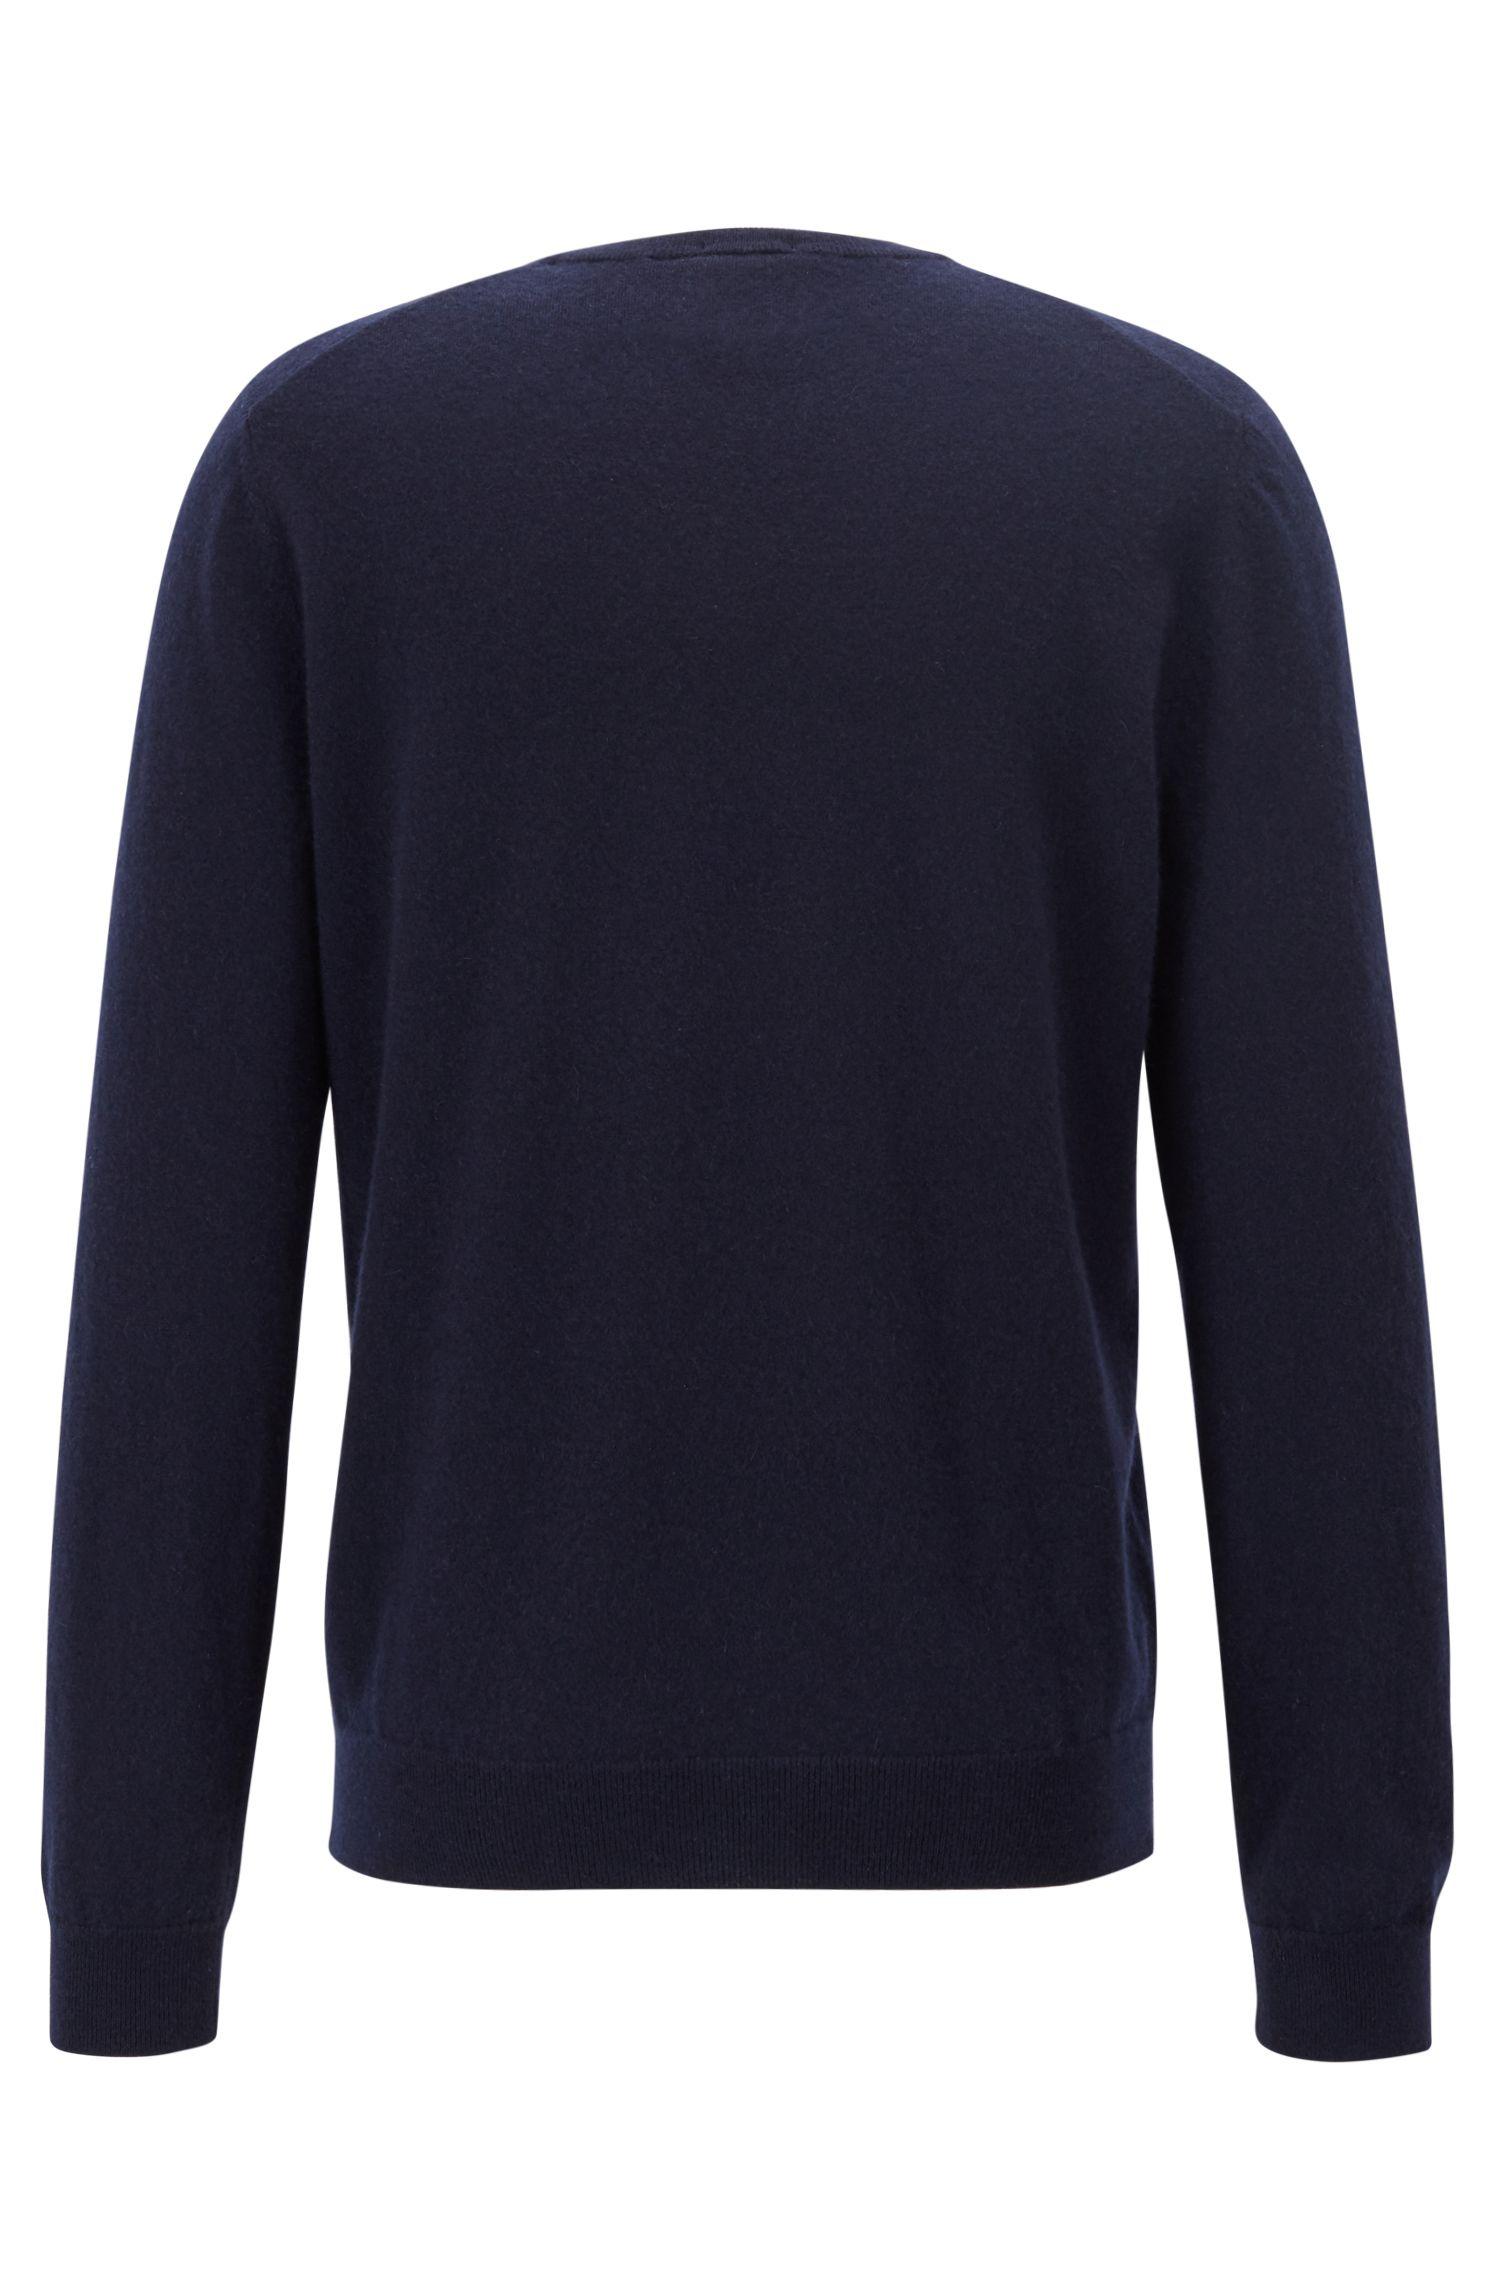 Leichter Regular-Fit Pullover aus italienischem Kaschmir, Dunkelblau